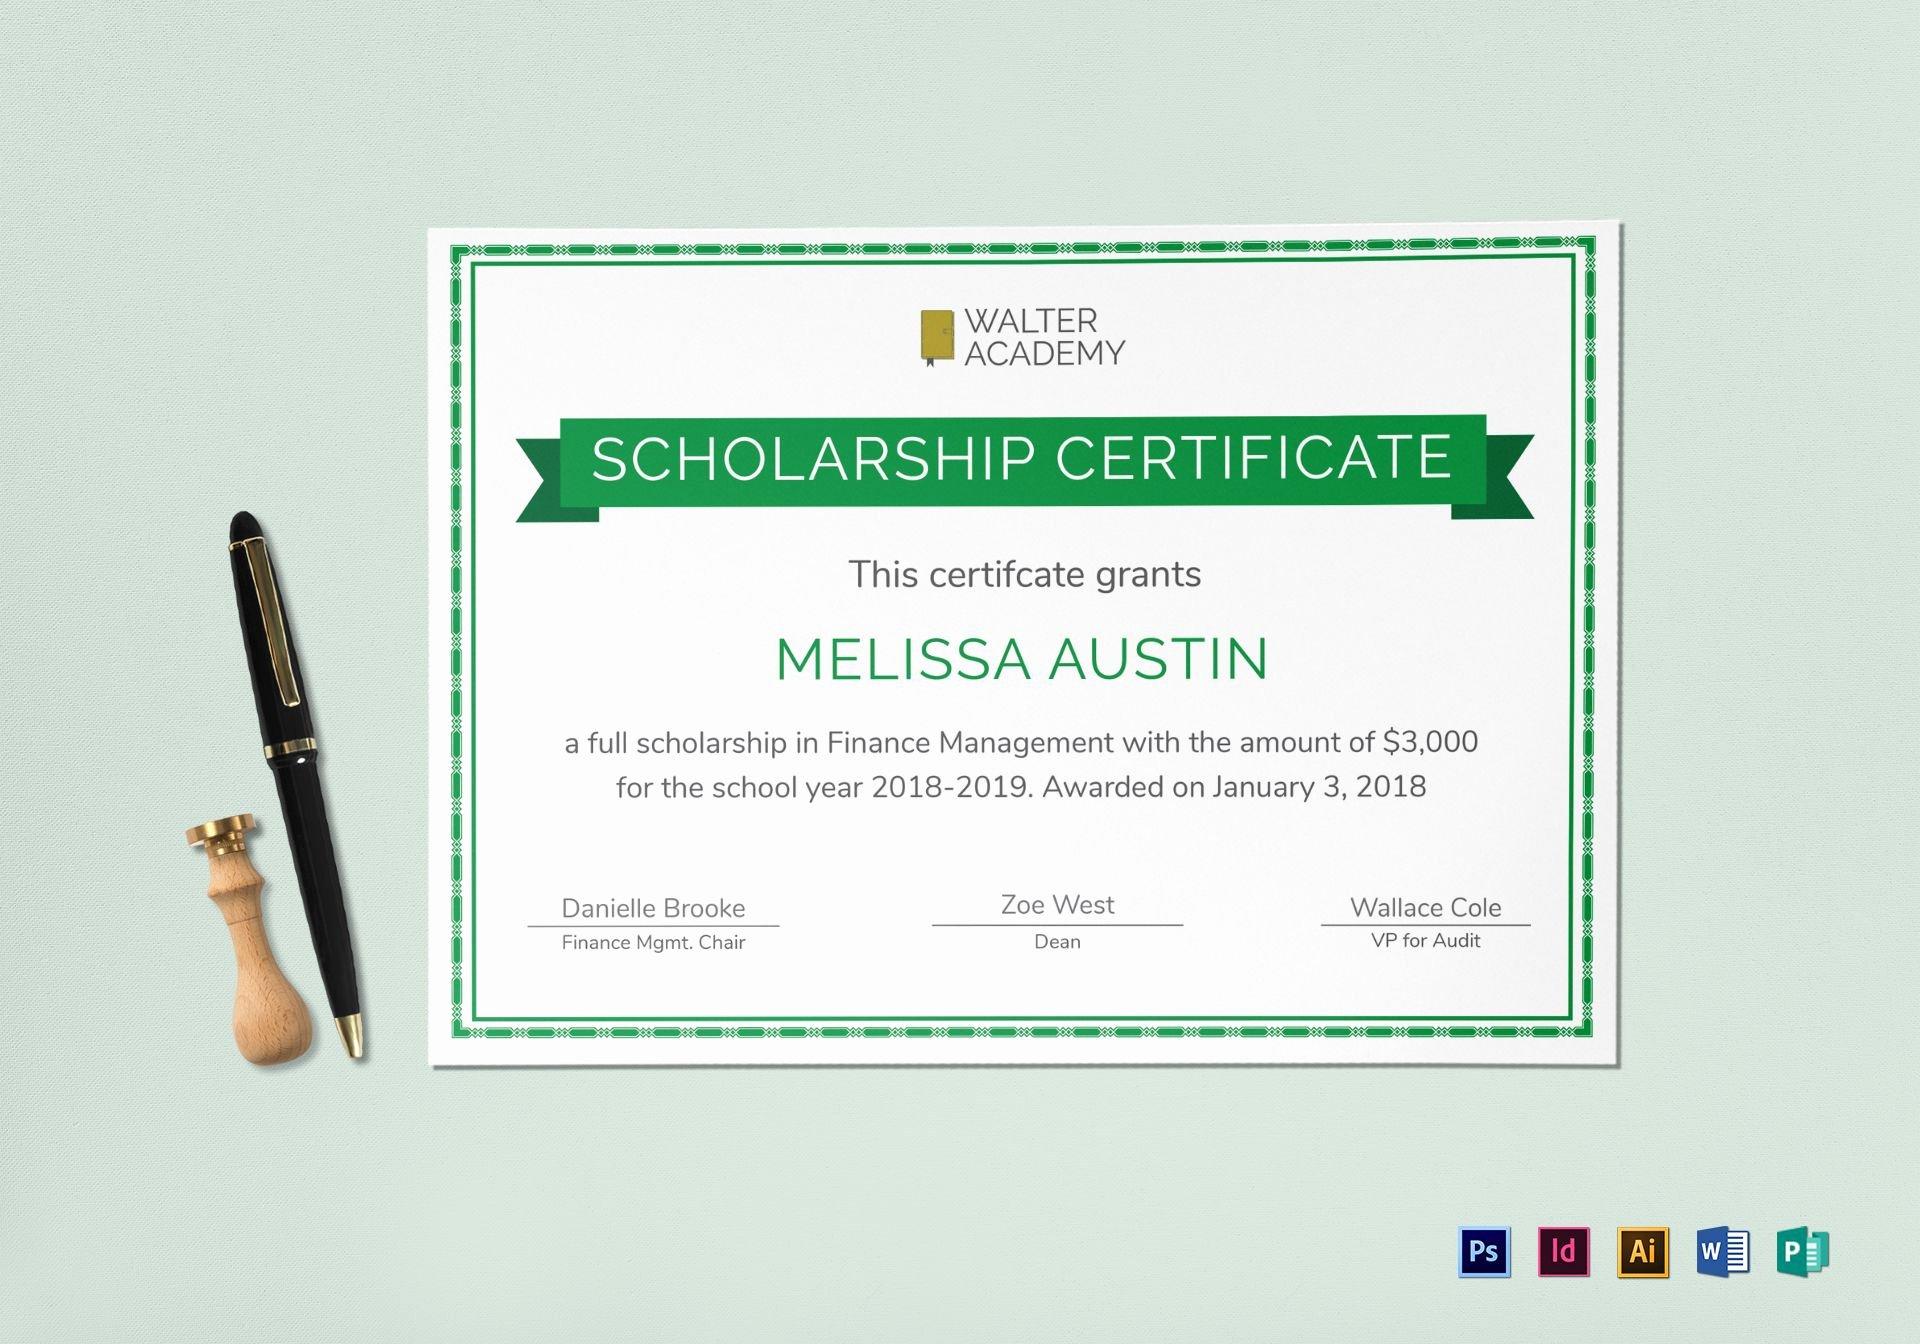 Scholarship Certificate Template Free Luxury Scholarship Certificate Design Template In Psd Word